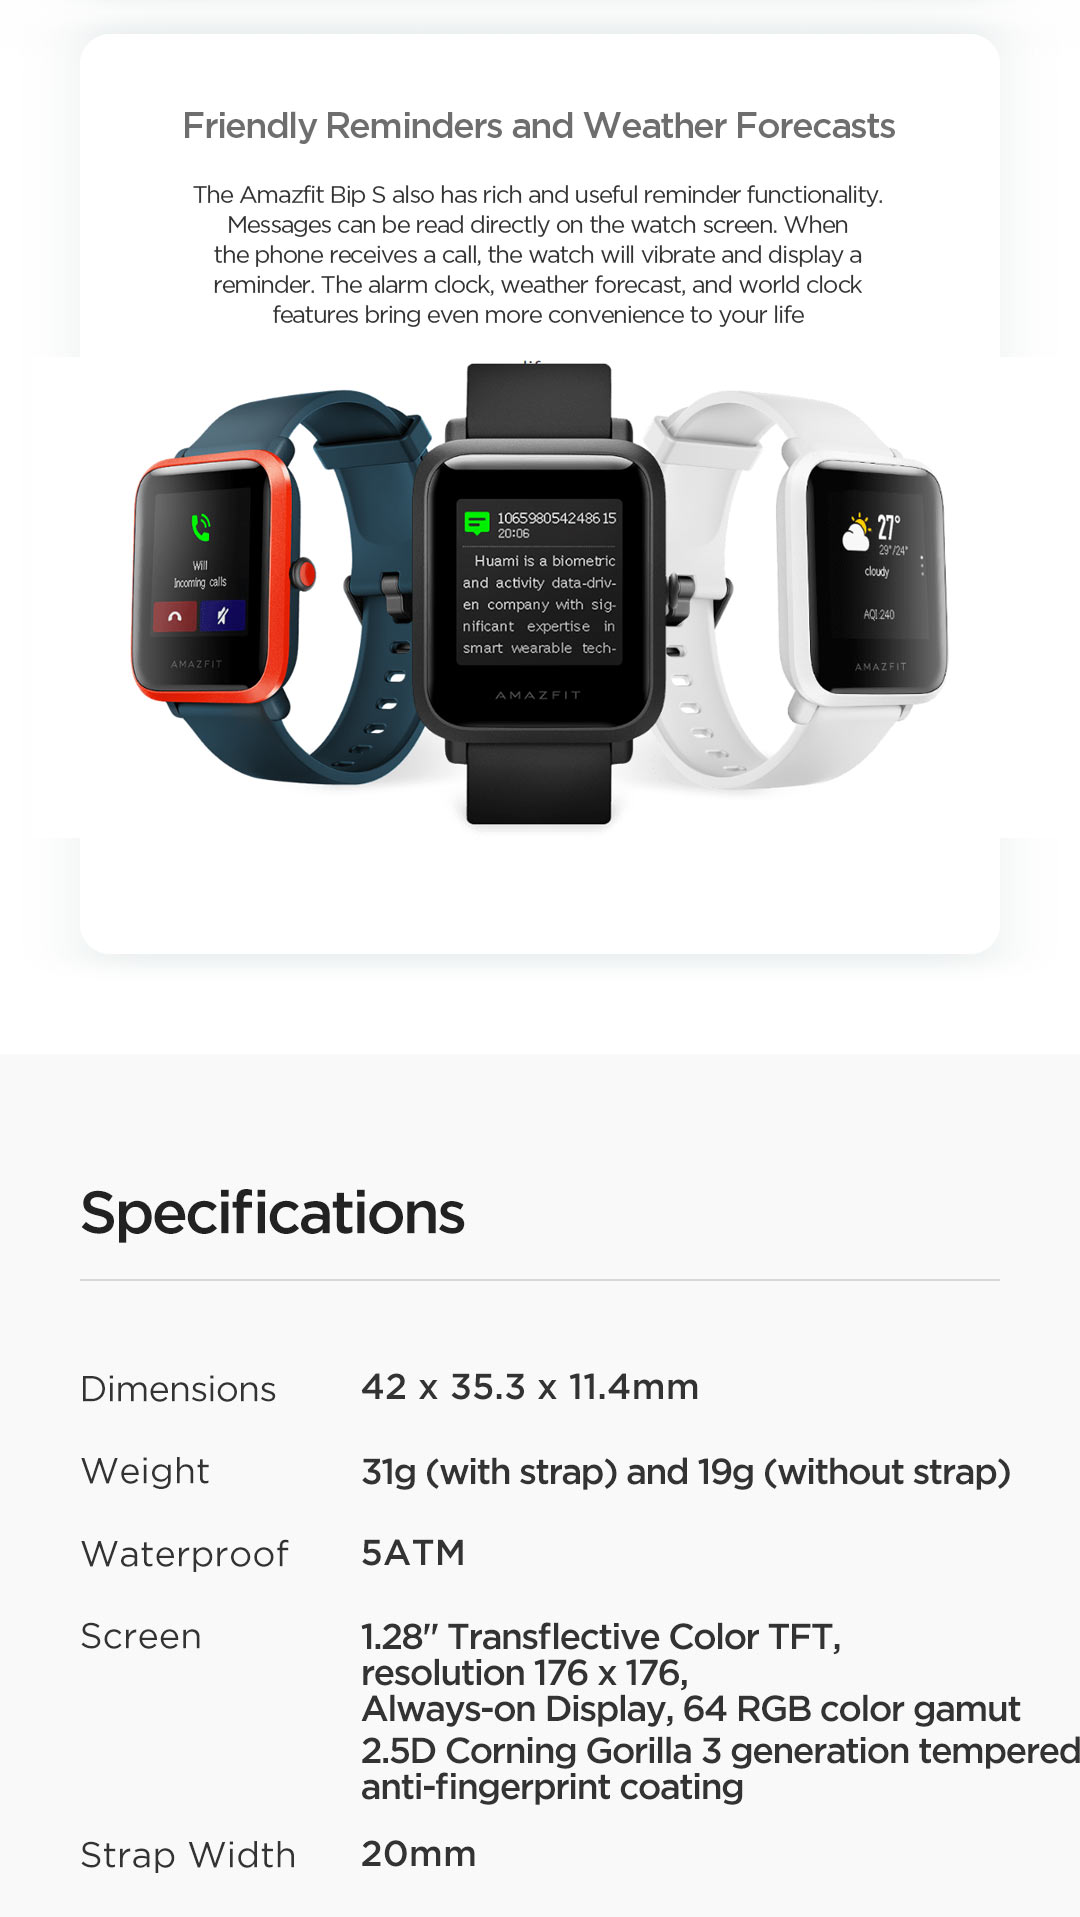 H97a46d9f6cd943fa910b4b11687d2759R In Stock 2020 Global Amazfit Bip S Smartwatch 5ATM waterproof built in GPS GLONASS Smart Watch for Android iOS Phone